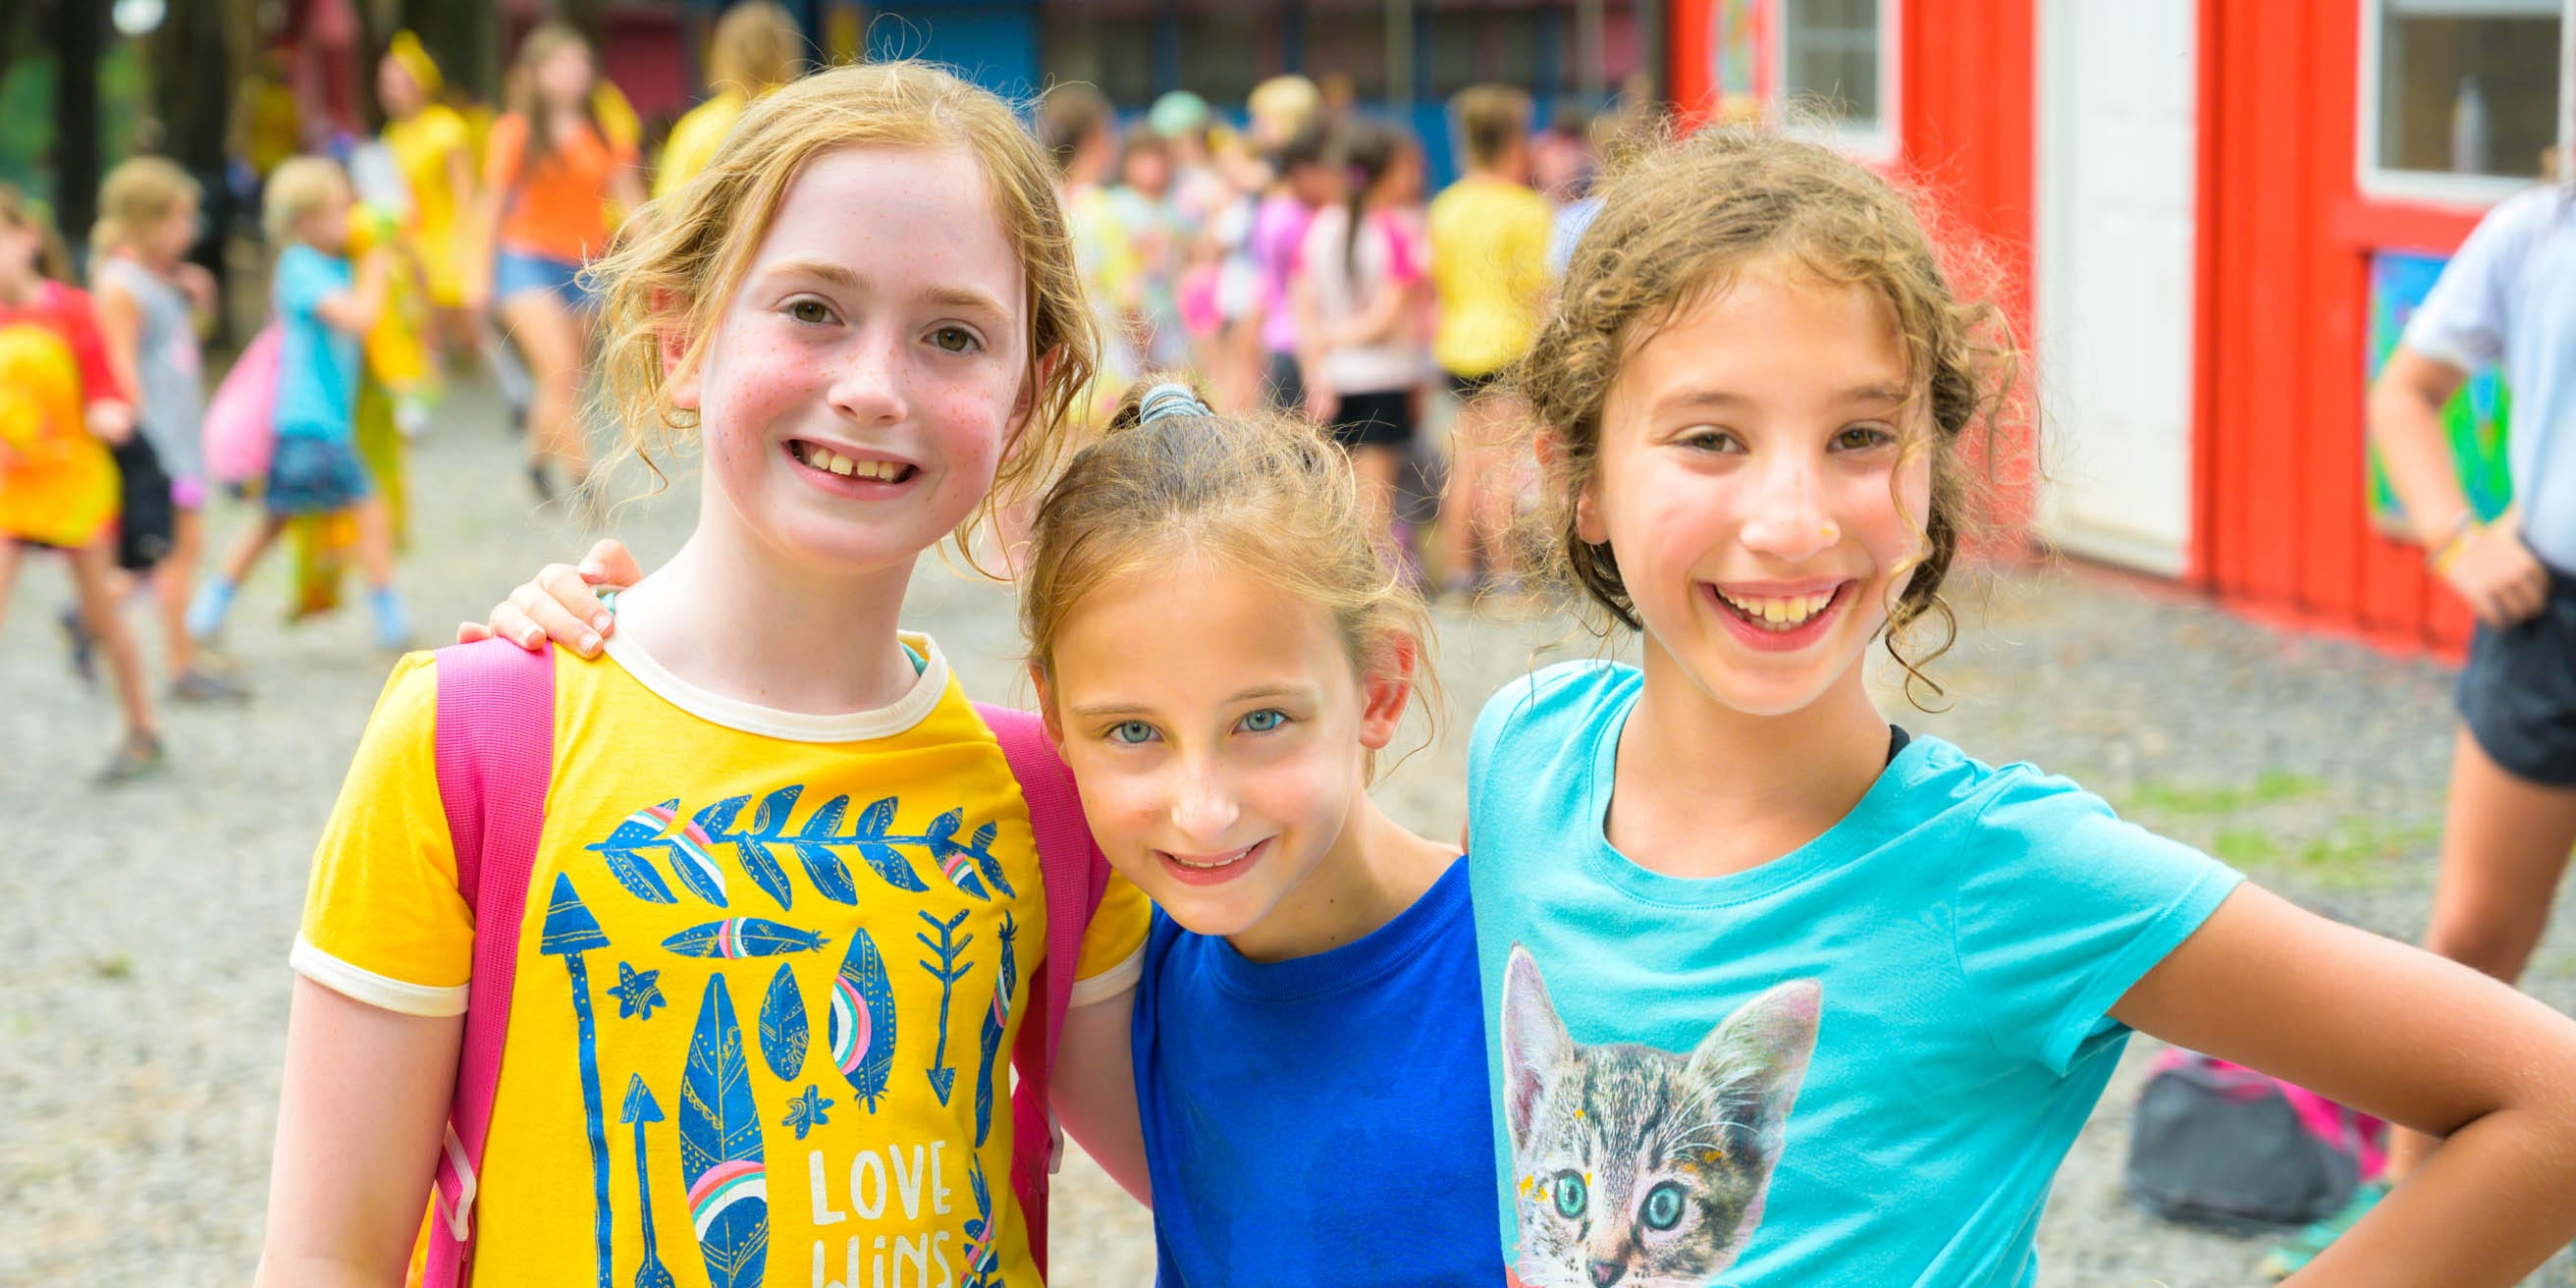 Three happy girls smiling